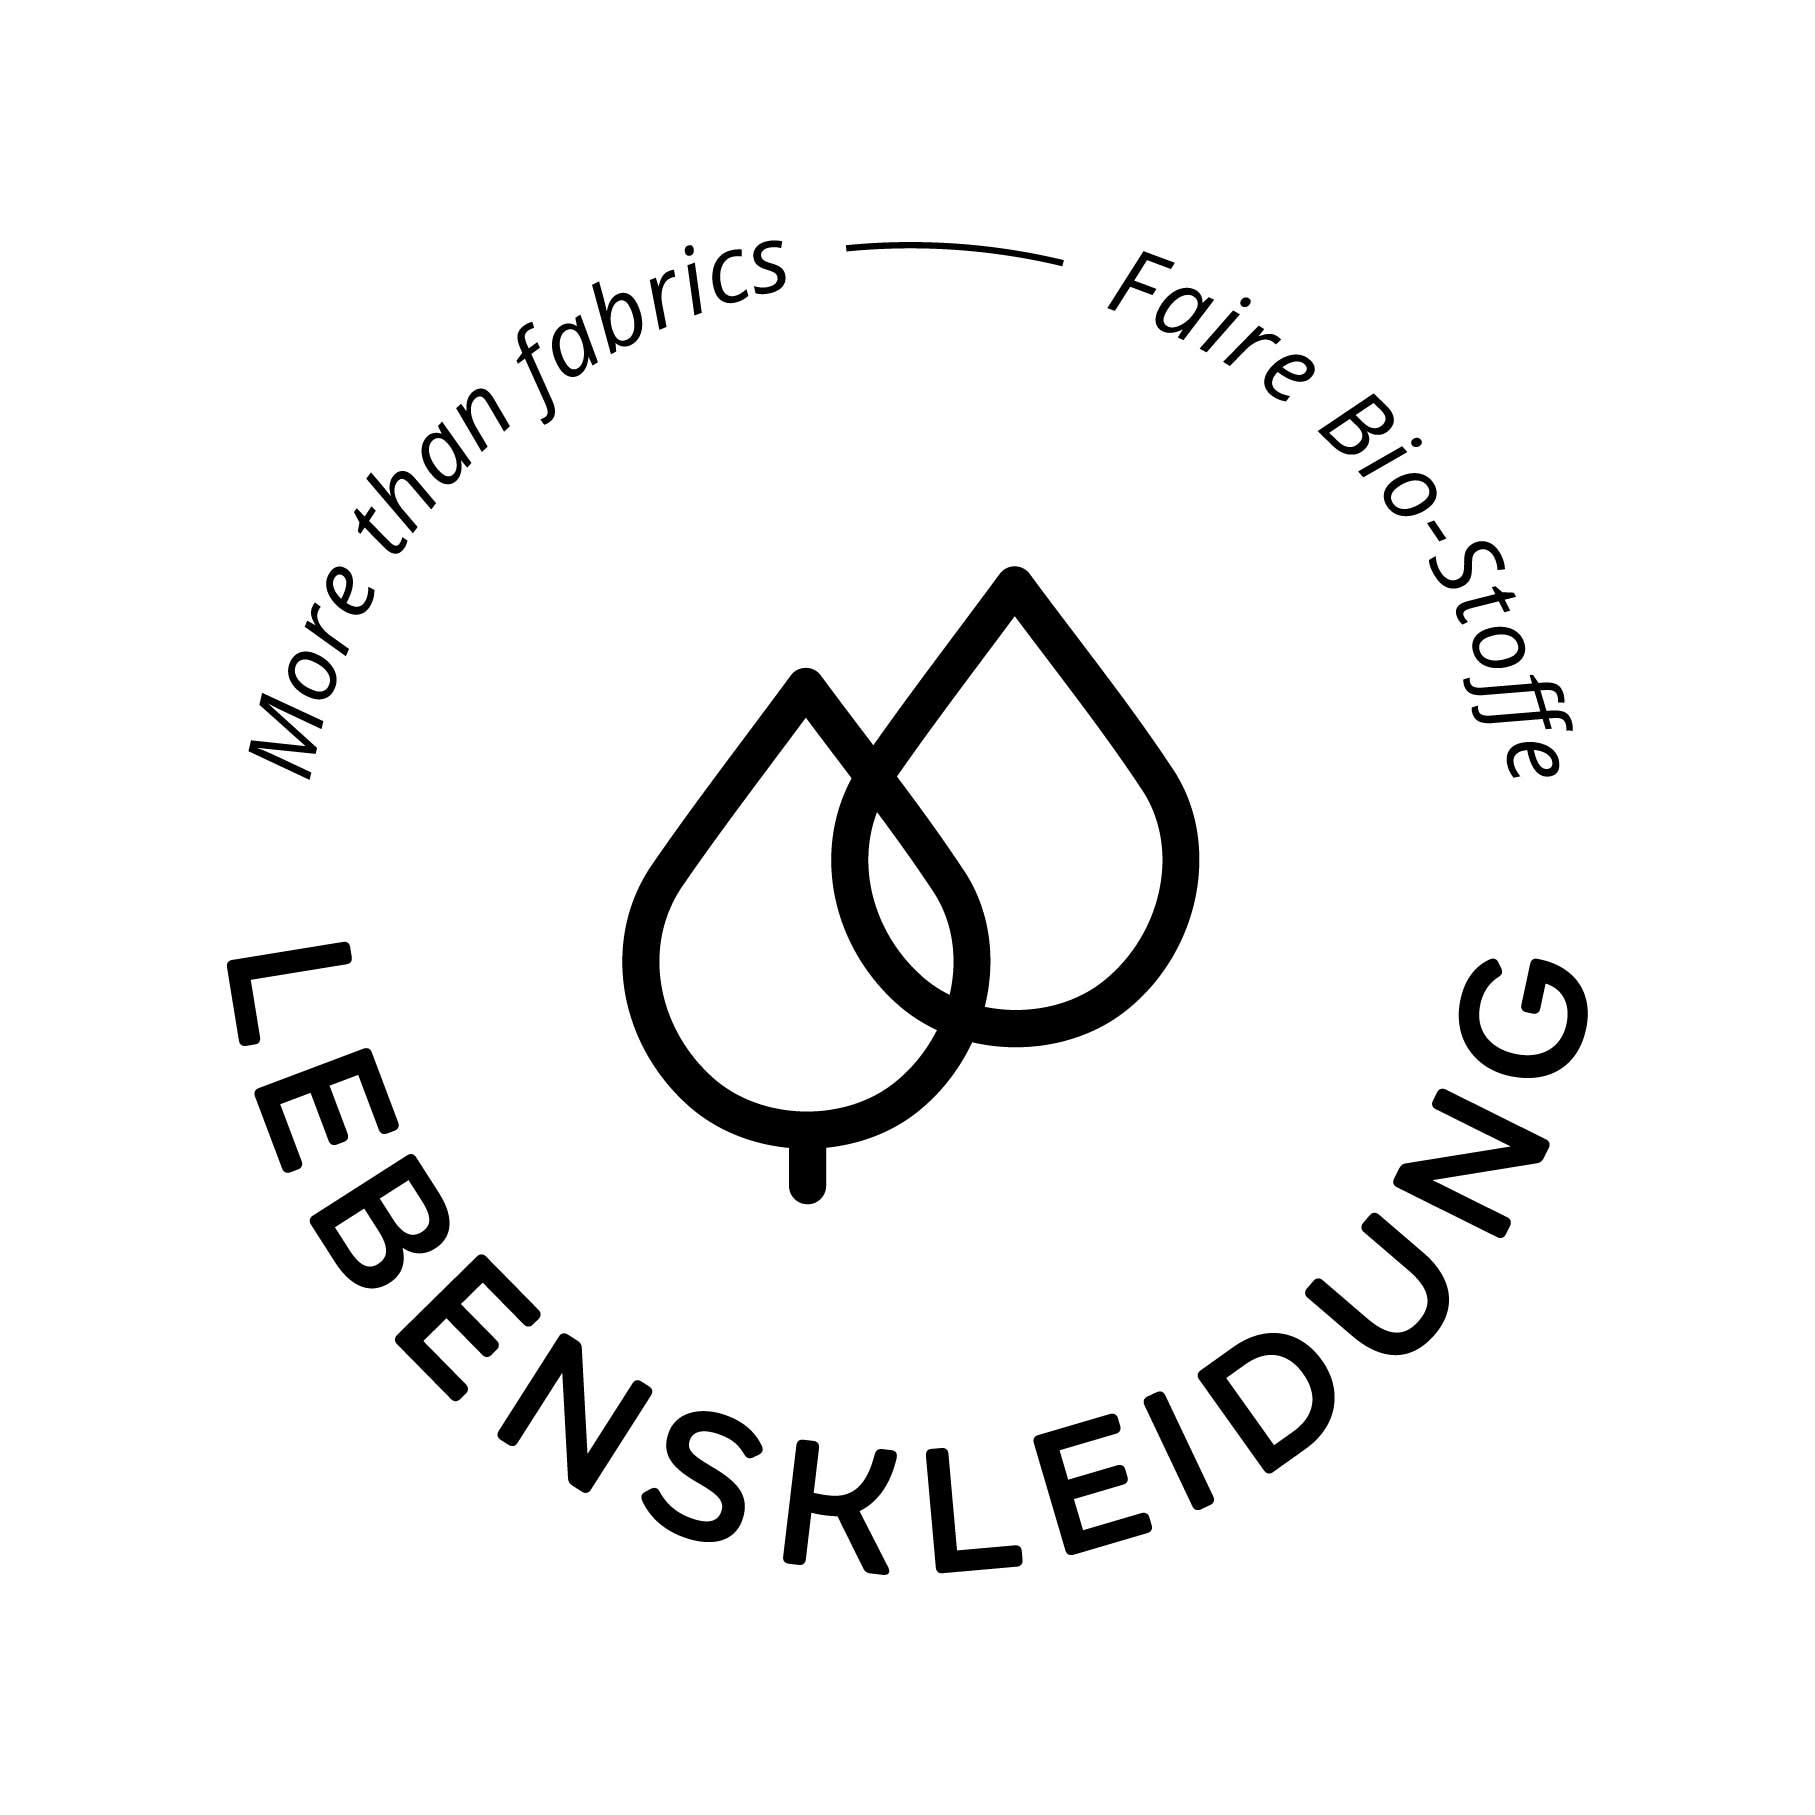 Bio Tissu Sweat brossé en deux couleurs - Navy-Ecru